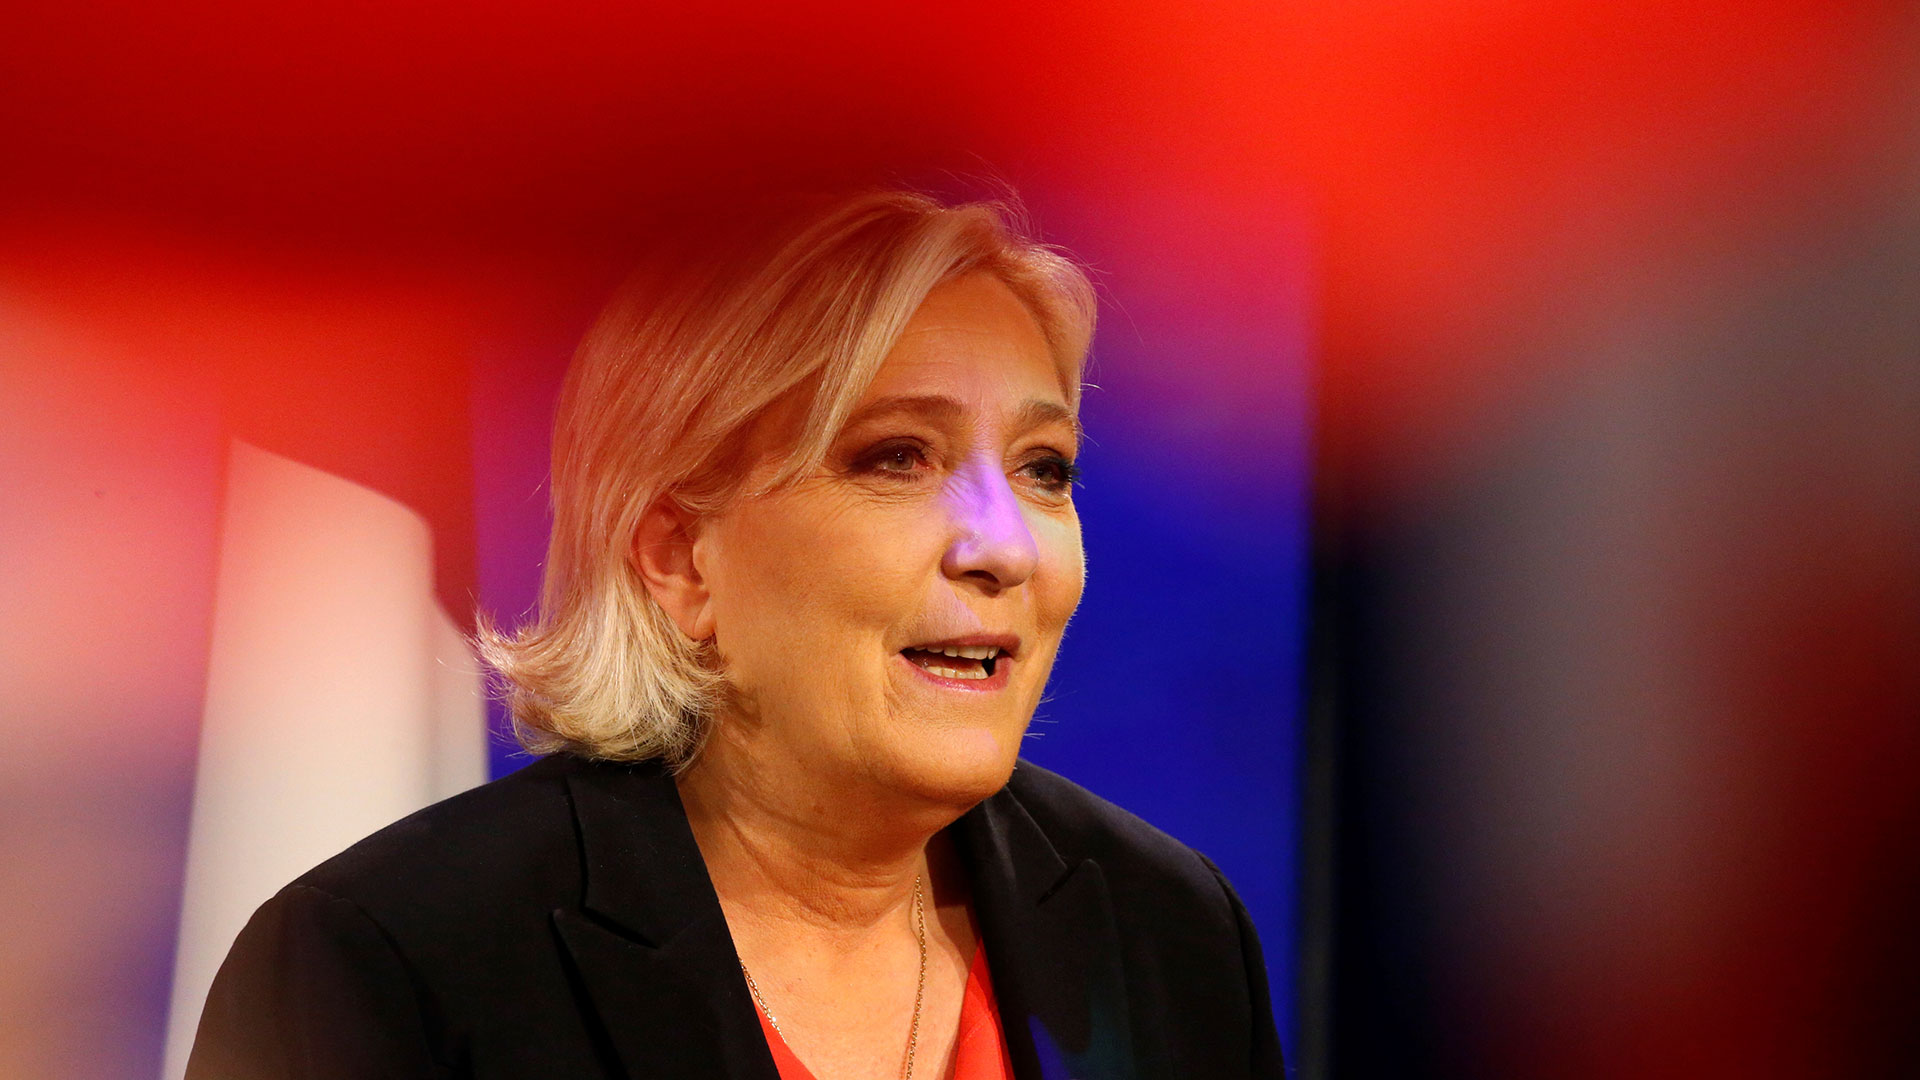 Frankrike talar om le pens rostfiske